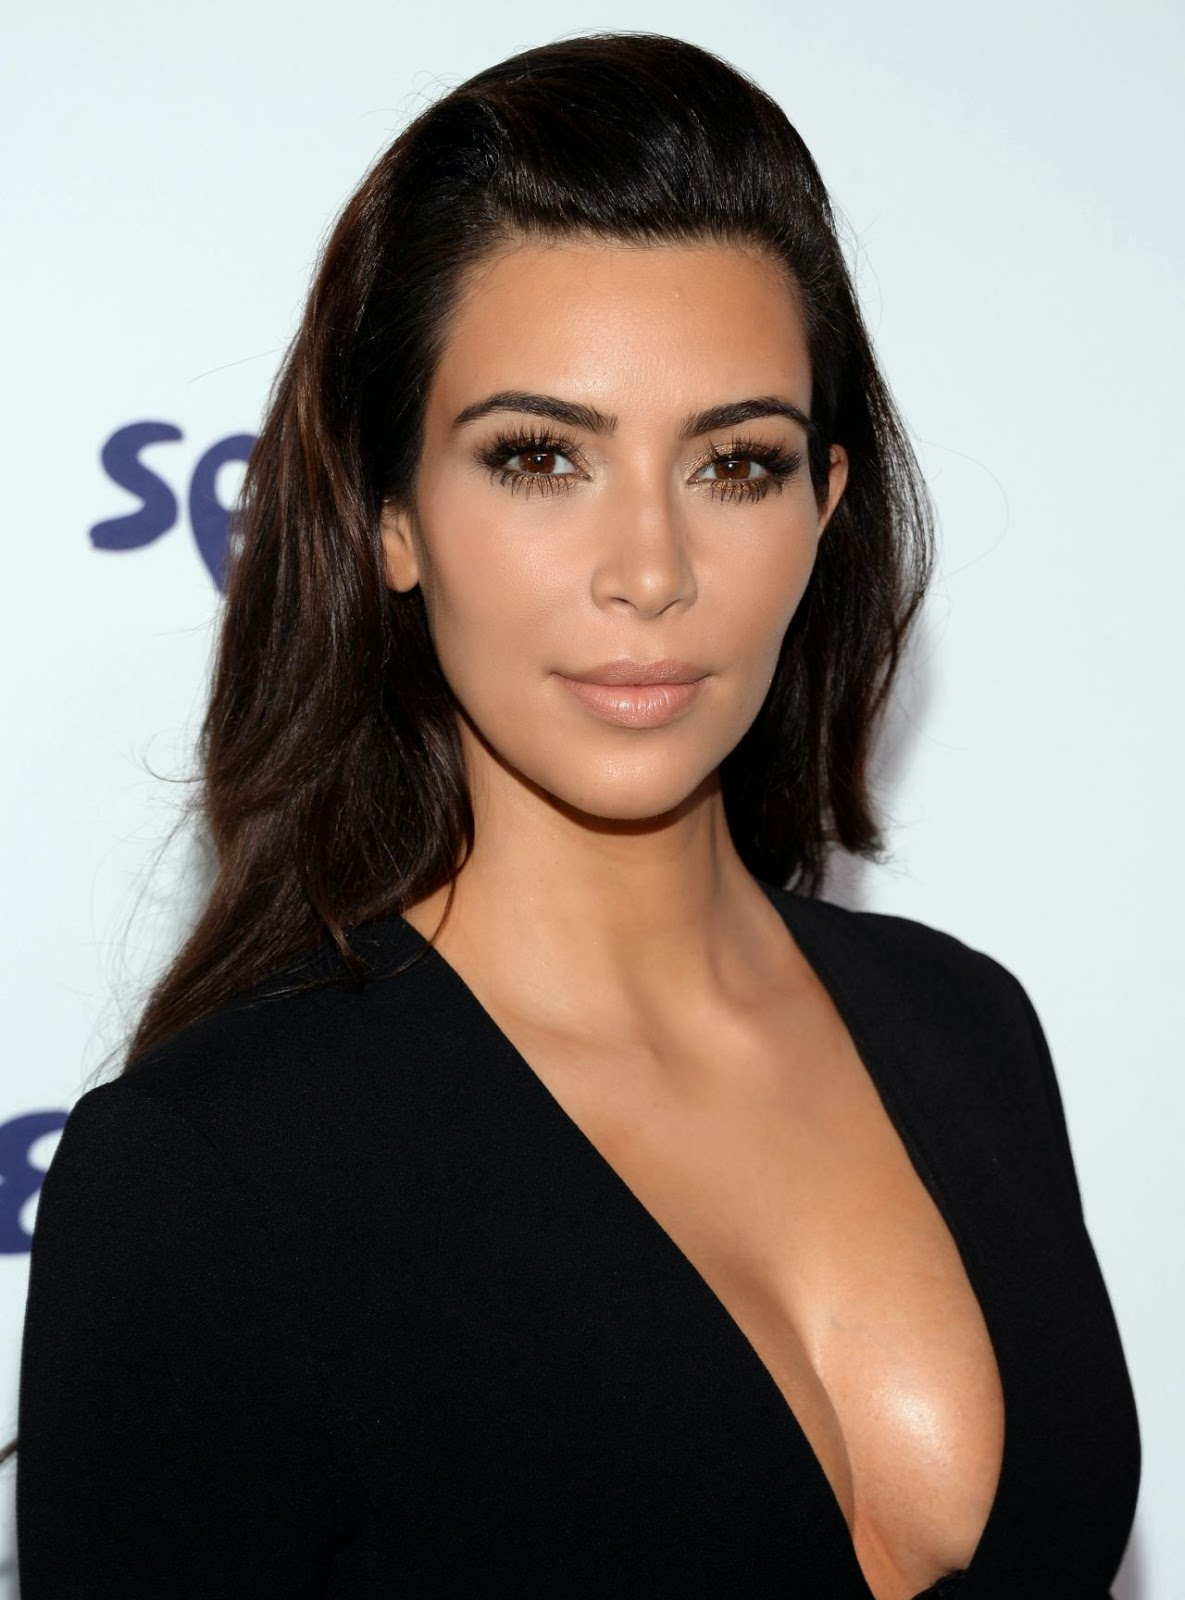 Kim Kardashian at the 2014 NBCUniversal Upfronts